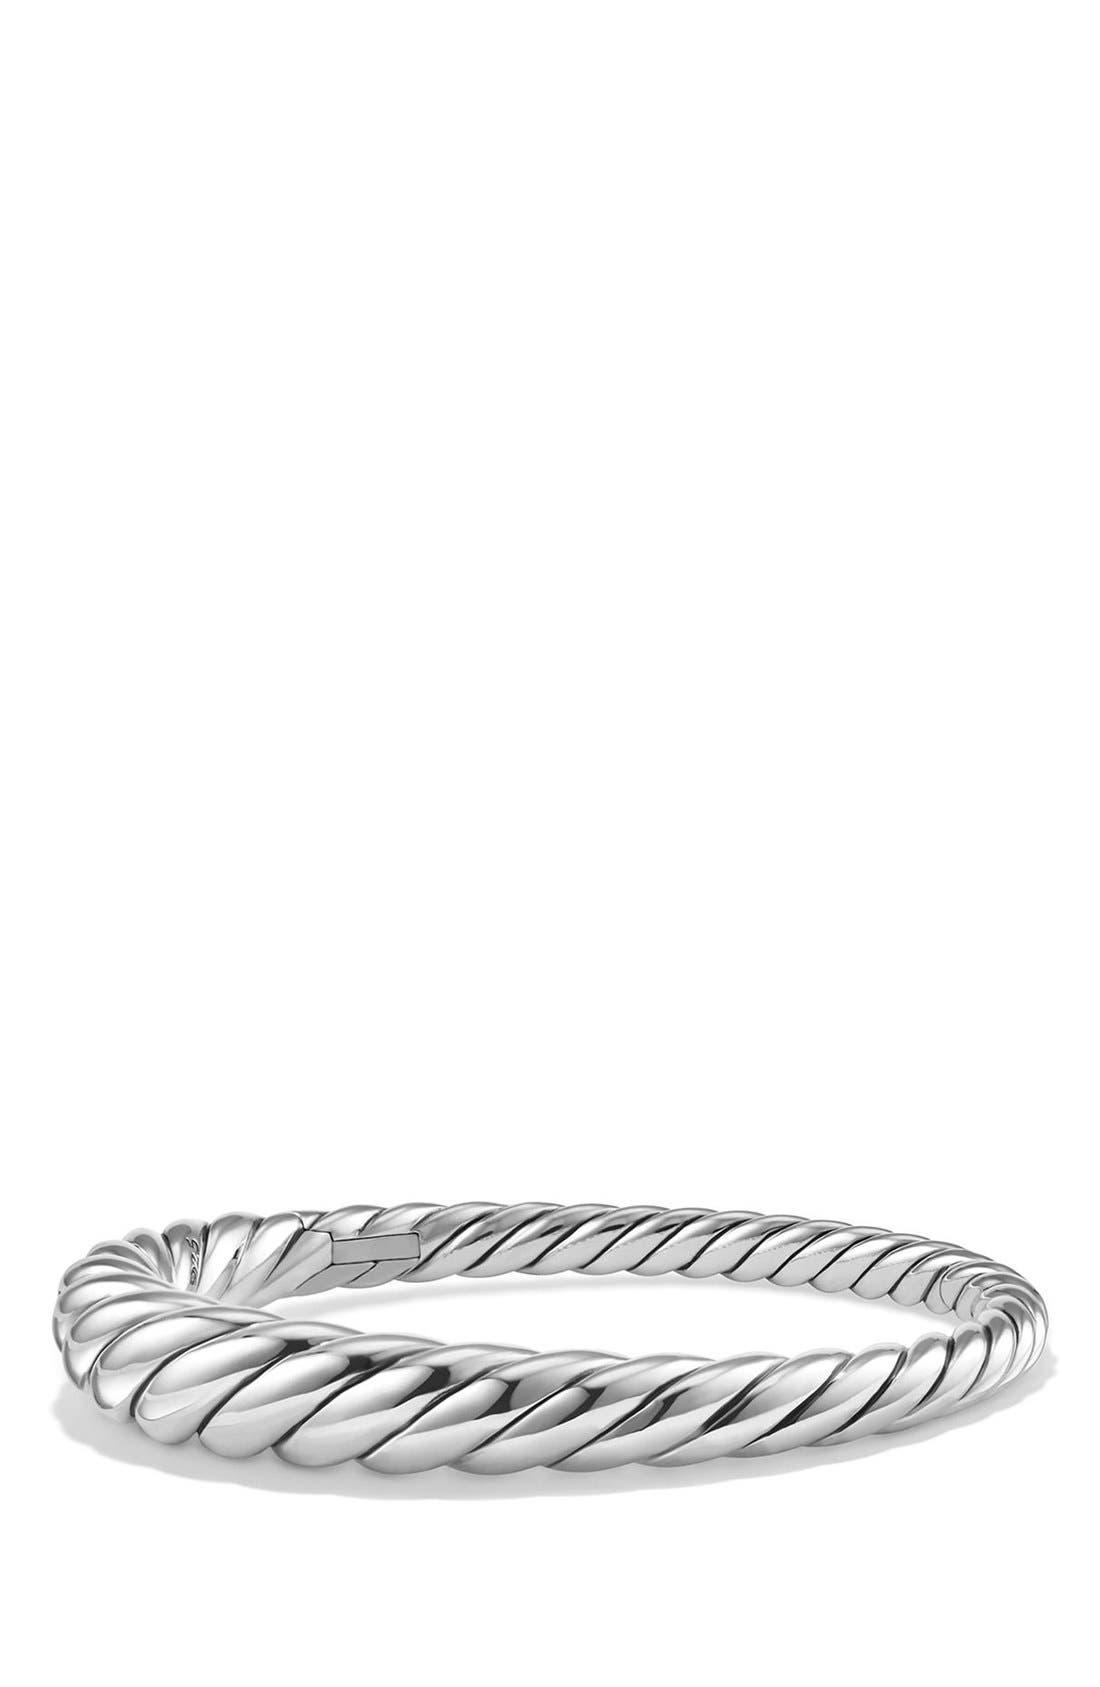 Alternate Image 1 Selected - David Yurman 'Pure Form' Small Cable Bracelet